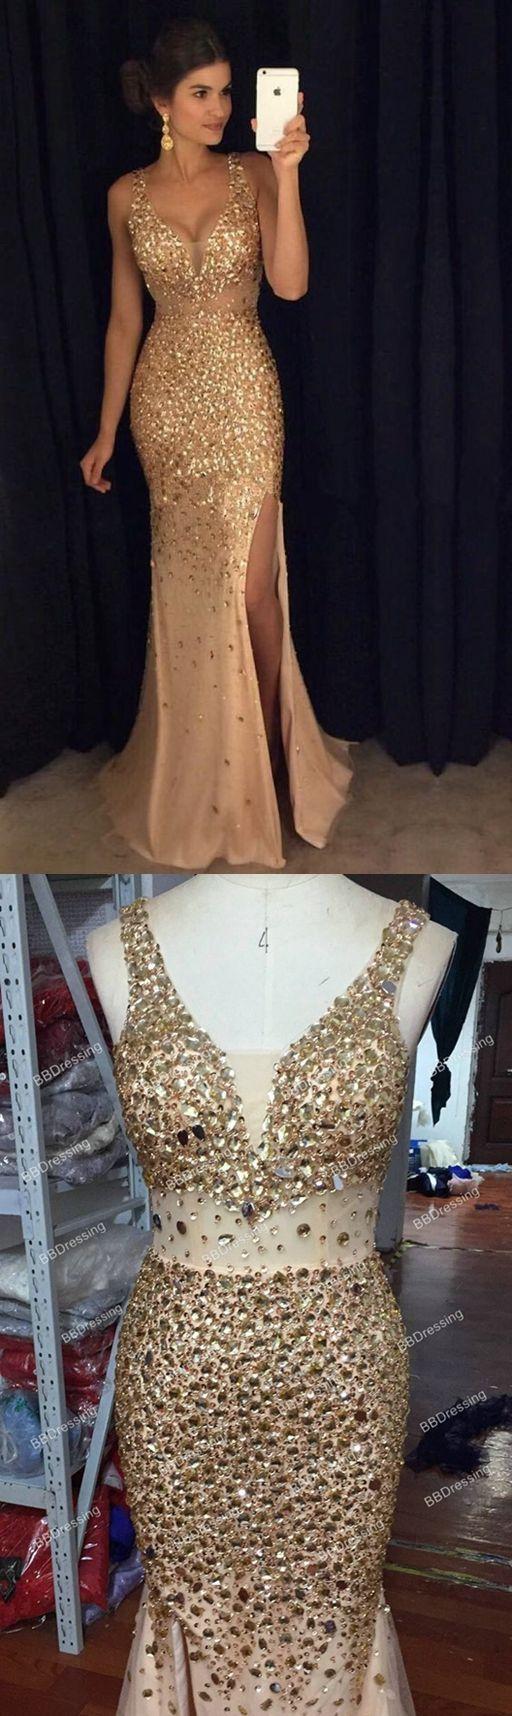 Gold Rhinestone Beaded Mermaid Evening Prom Dresses, Sexy See ...